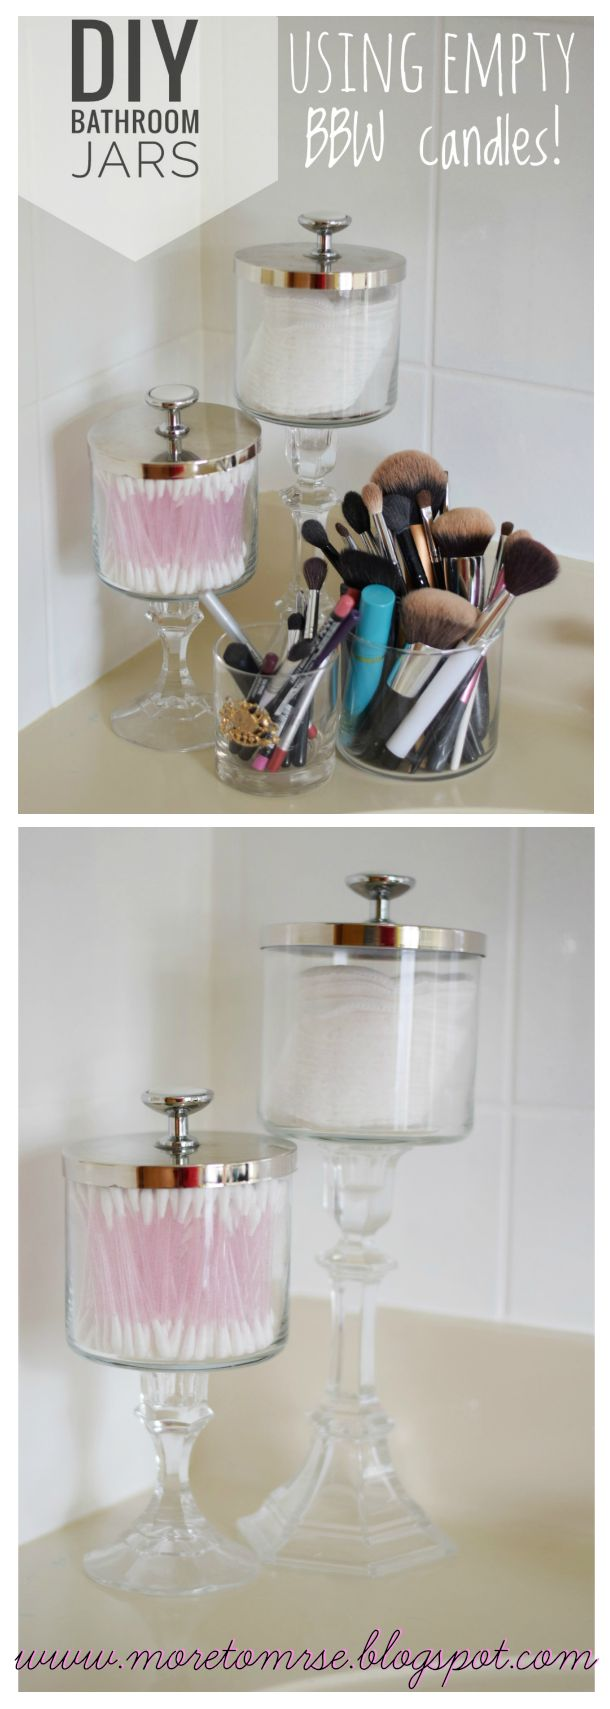 best 25+ apothecary bathroom ideas on pinterest | apothecary jars